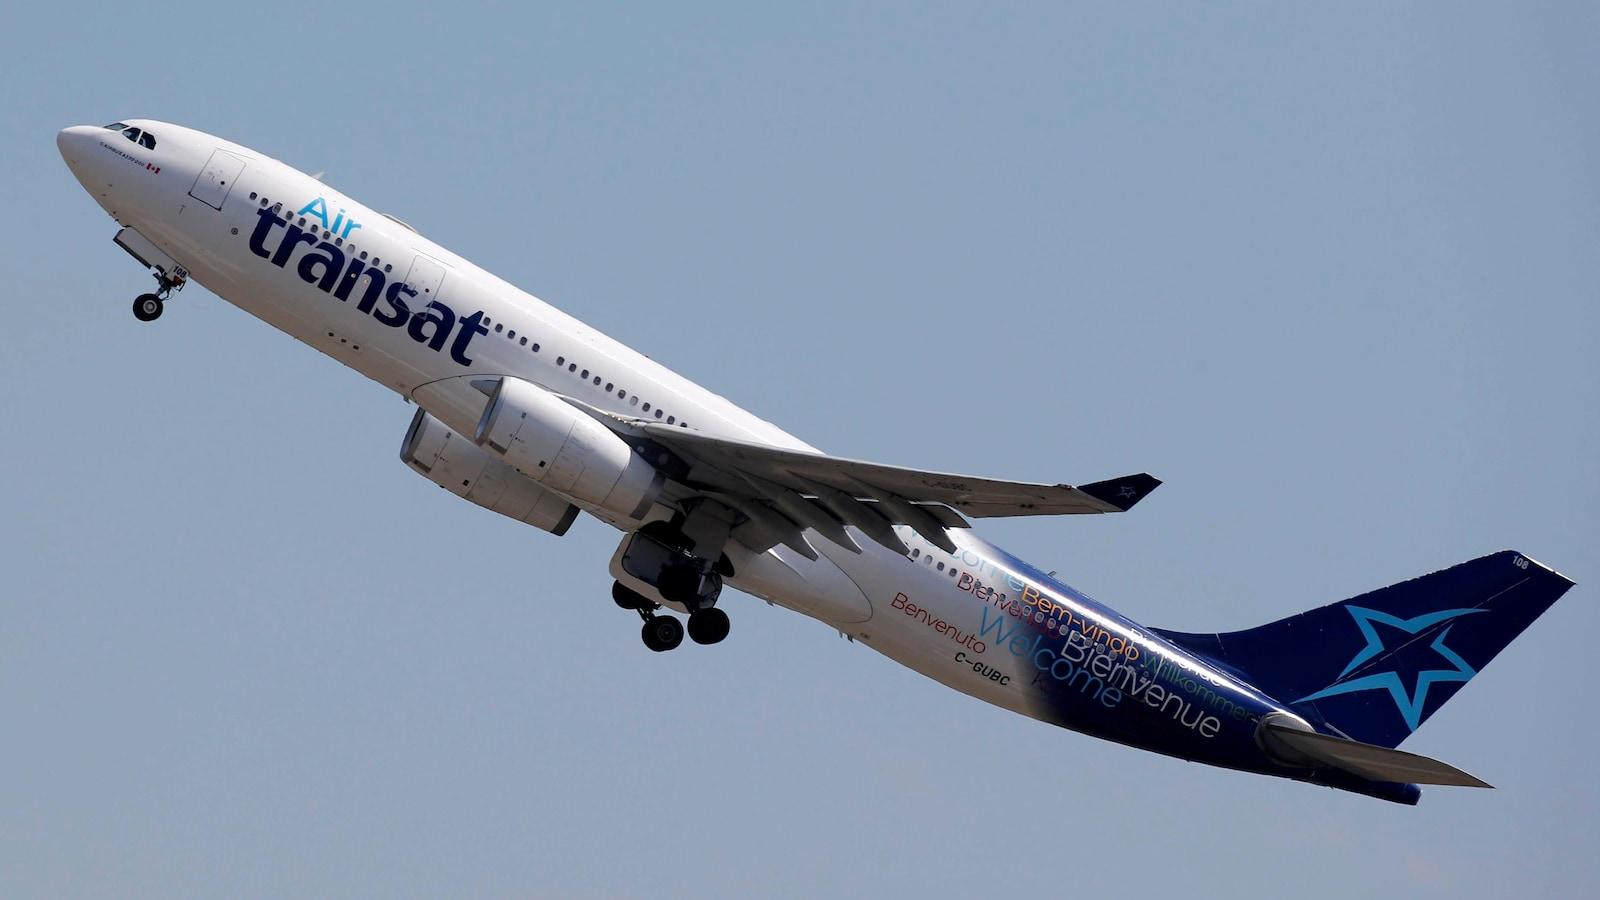 Un Airbus A330 dans les airs.